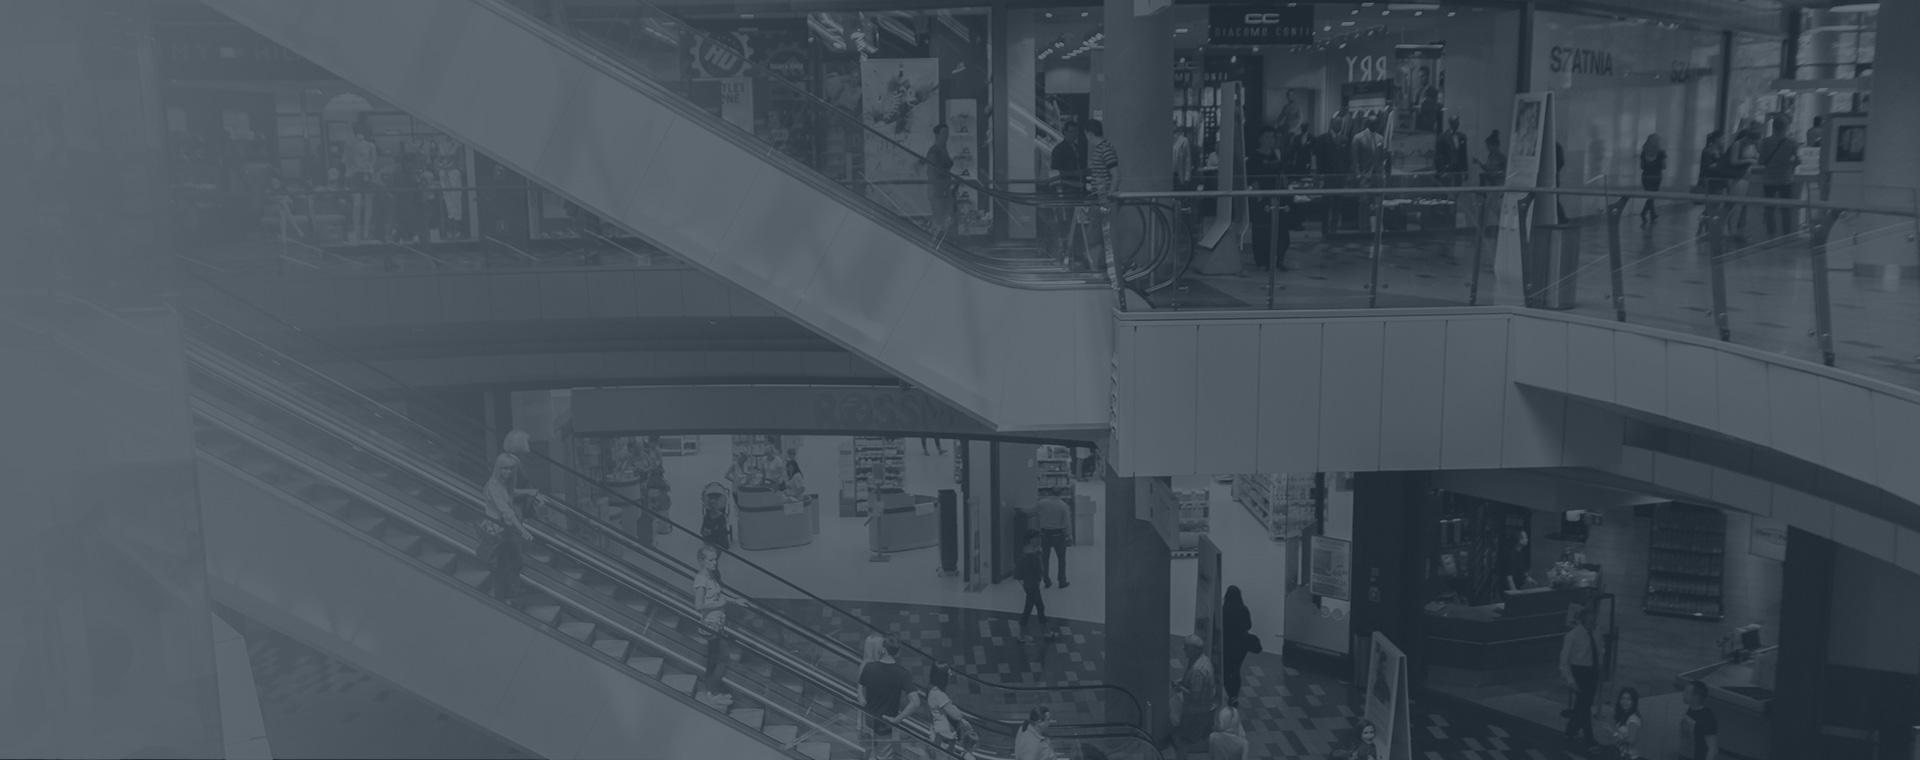 Centres commerciaux axe marché Arclan